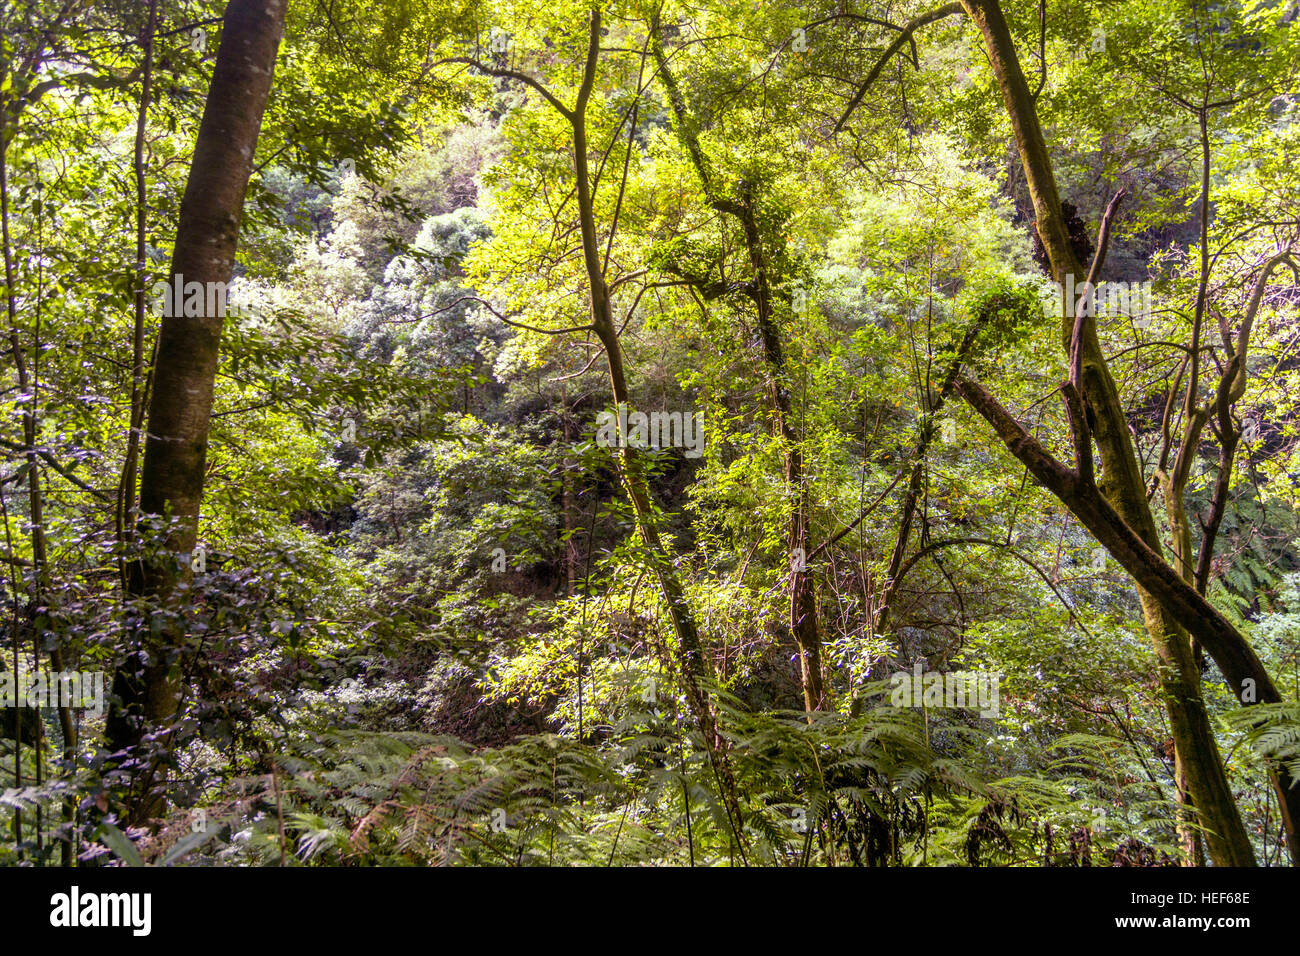 Laurel Wald, Los Tilos-Biosphären-Reservat, La Palma, Kanarische Inseln, Spanien Stockbild